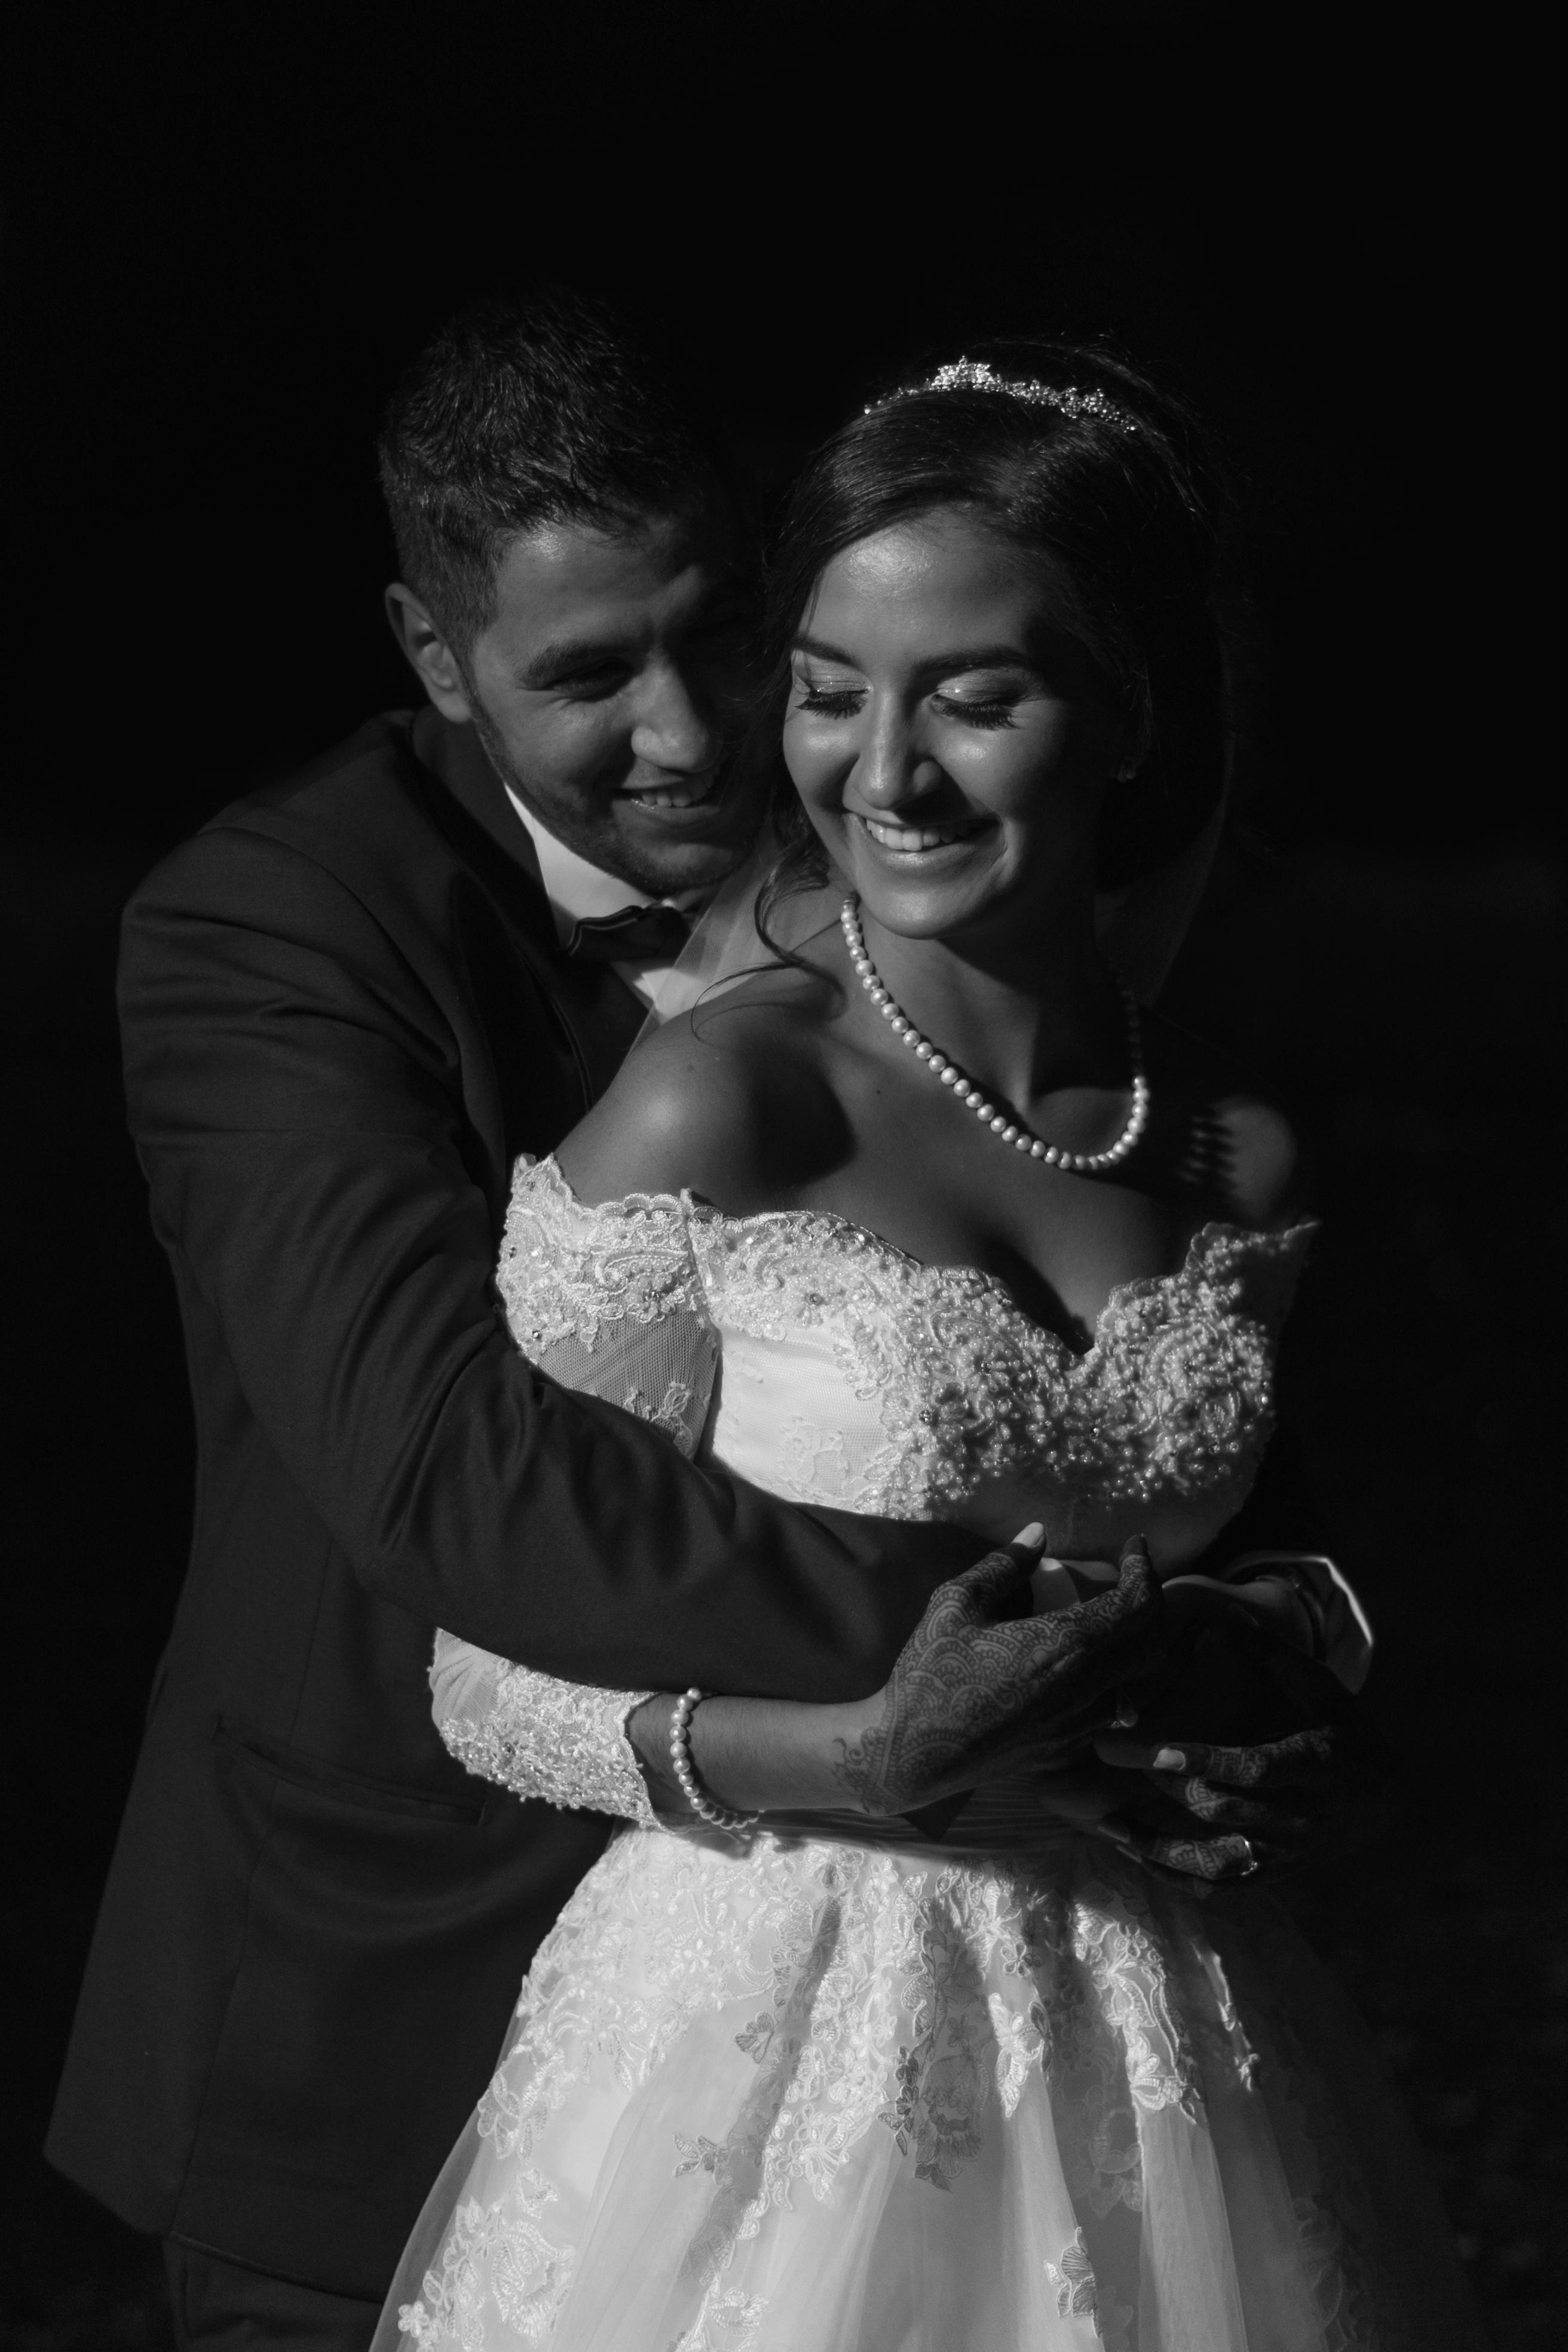 photographe mariage lille marocain roubaix tourcoing arabe musulman berbère robes mariée henné maghrébin